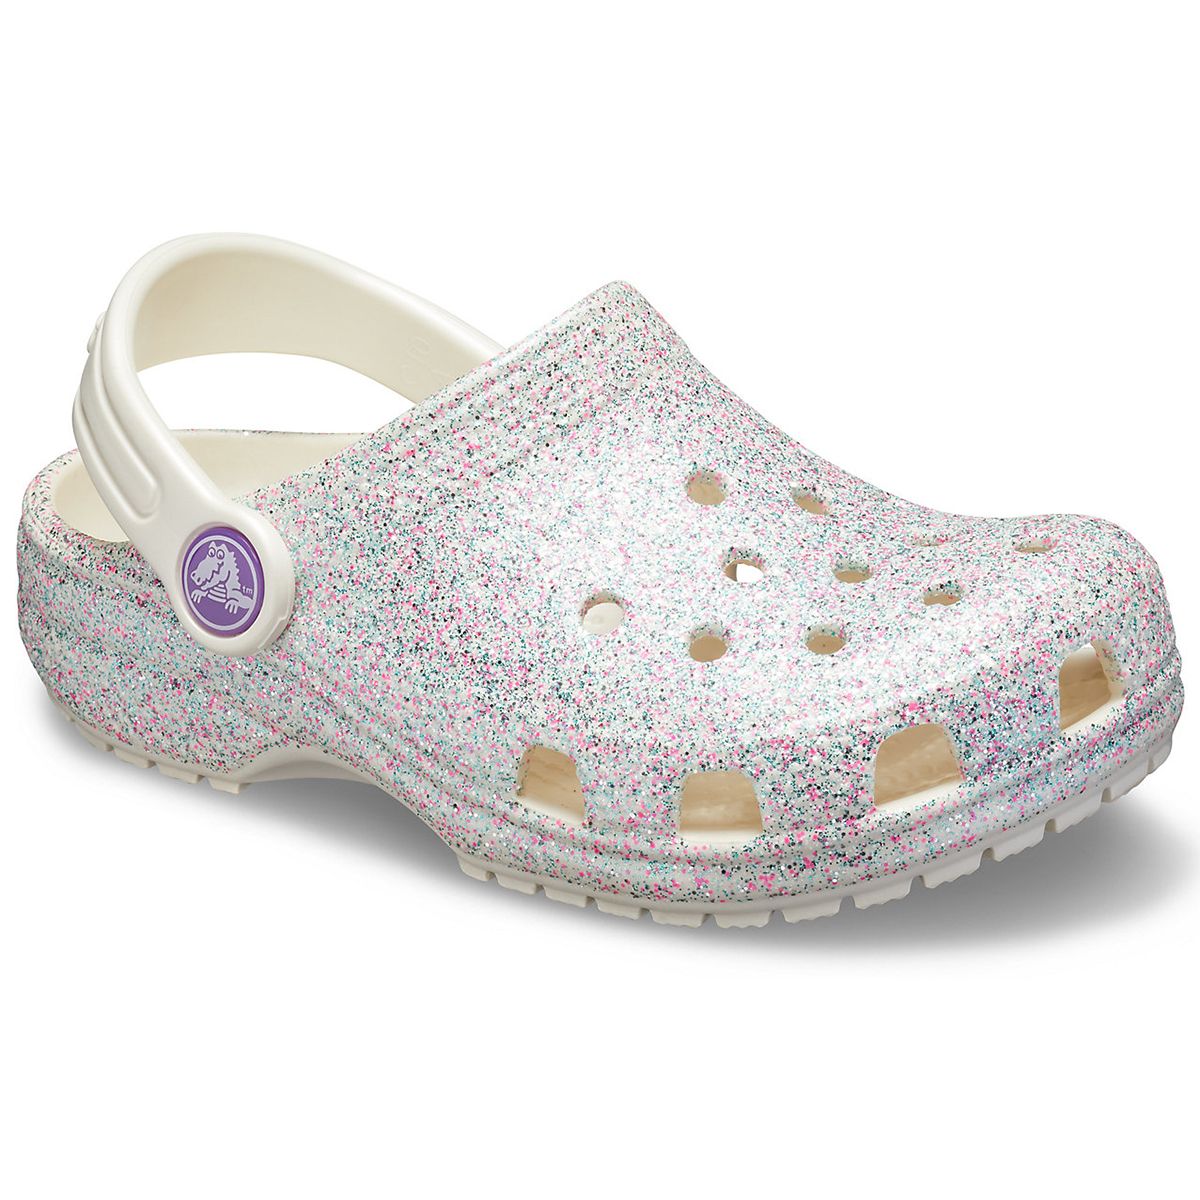 Crocs Girls' Classic Glitter Clog - White, 1